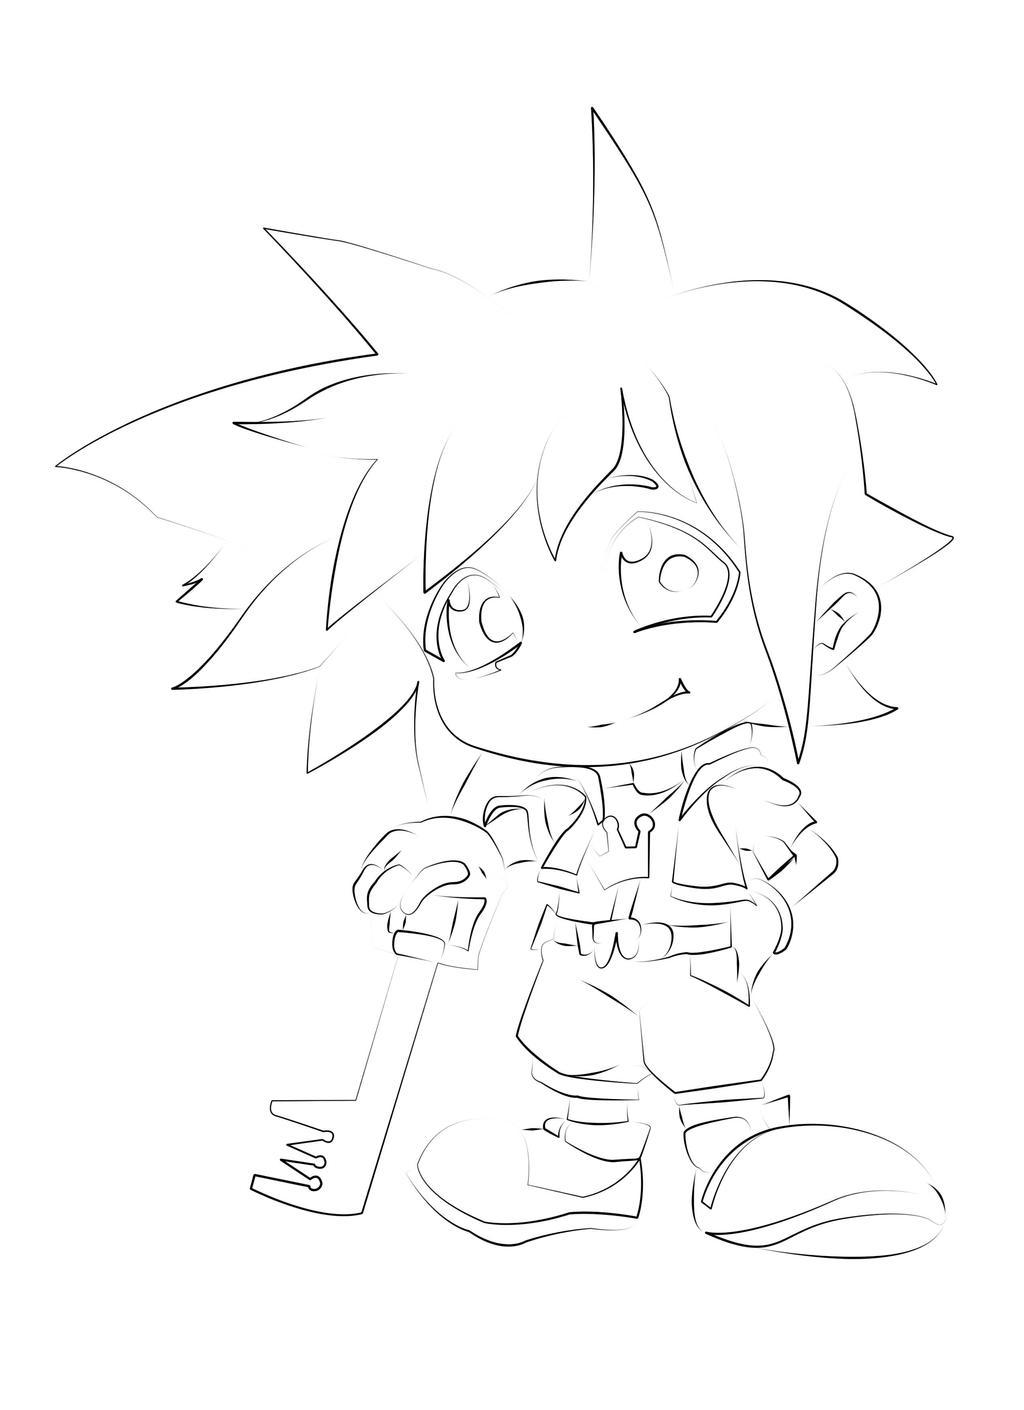 Sora Kingdom Hearts Lineart : Sora chibi kingdom hearts lineart by kojidark on deviantart